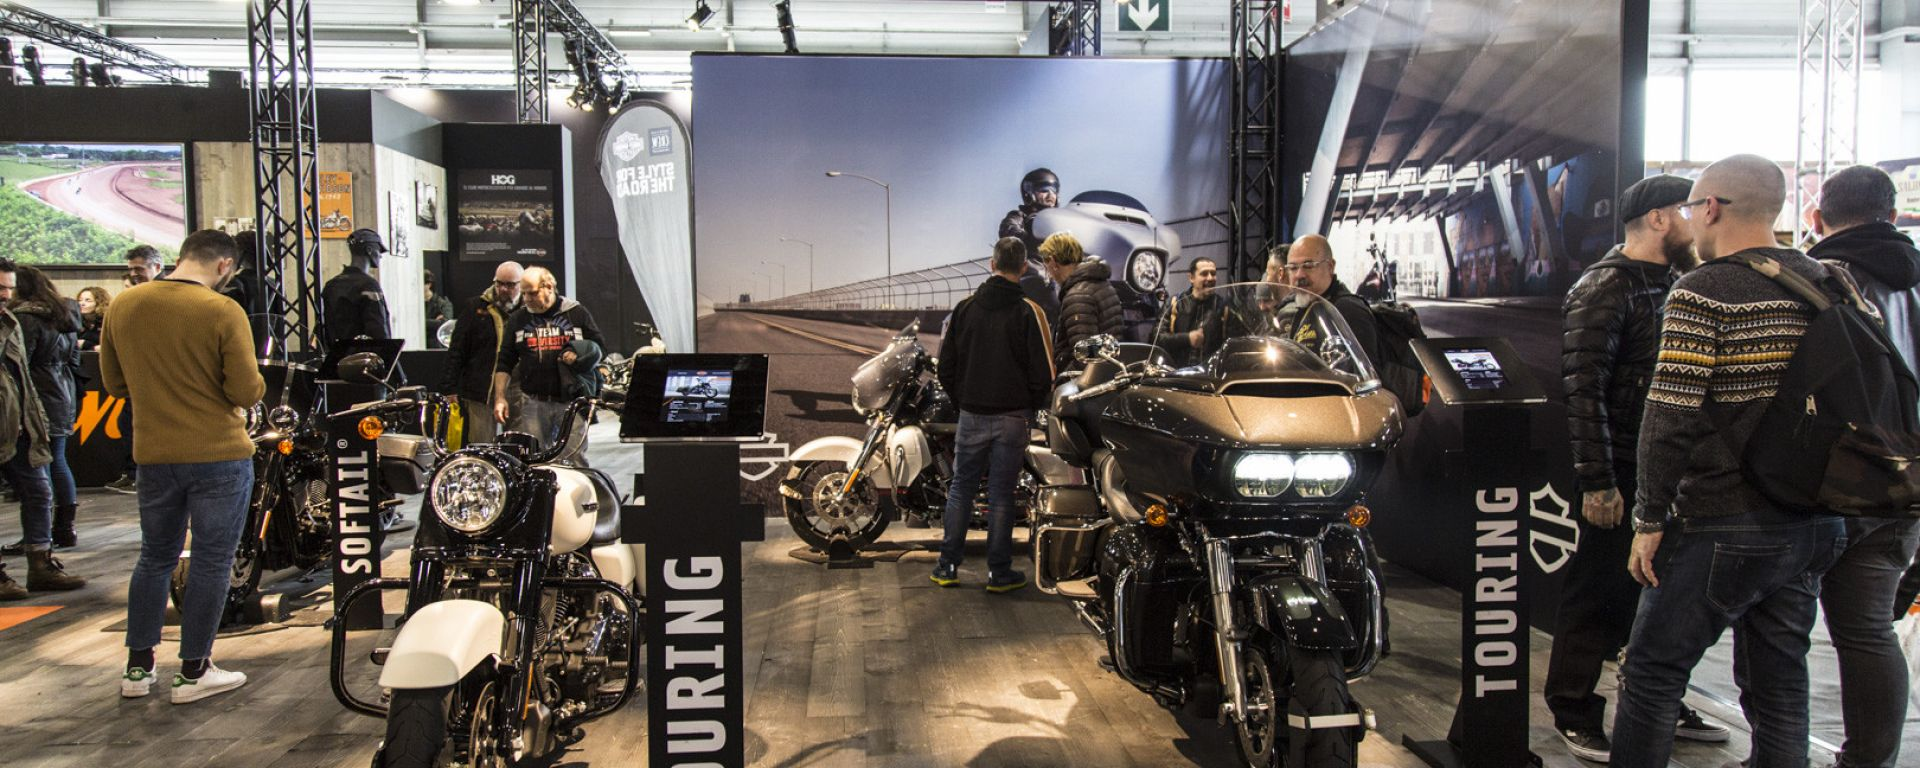 Lo stand di Harley-Davidson di Verona